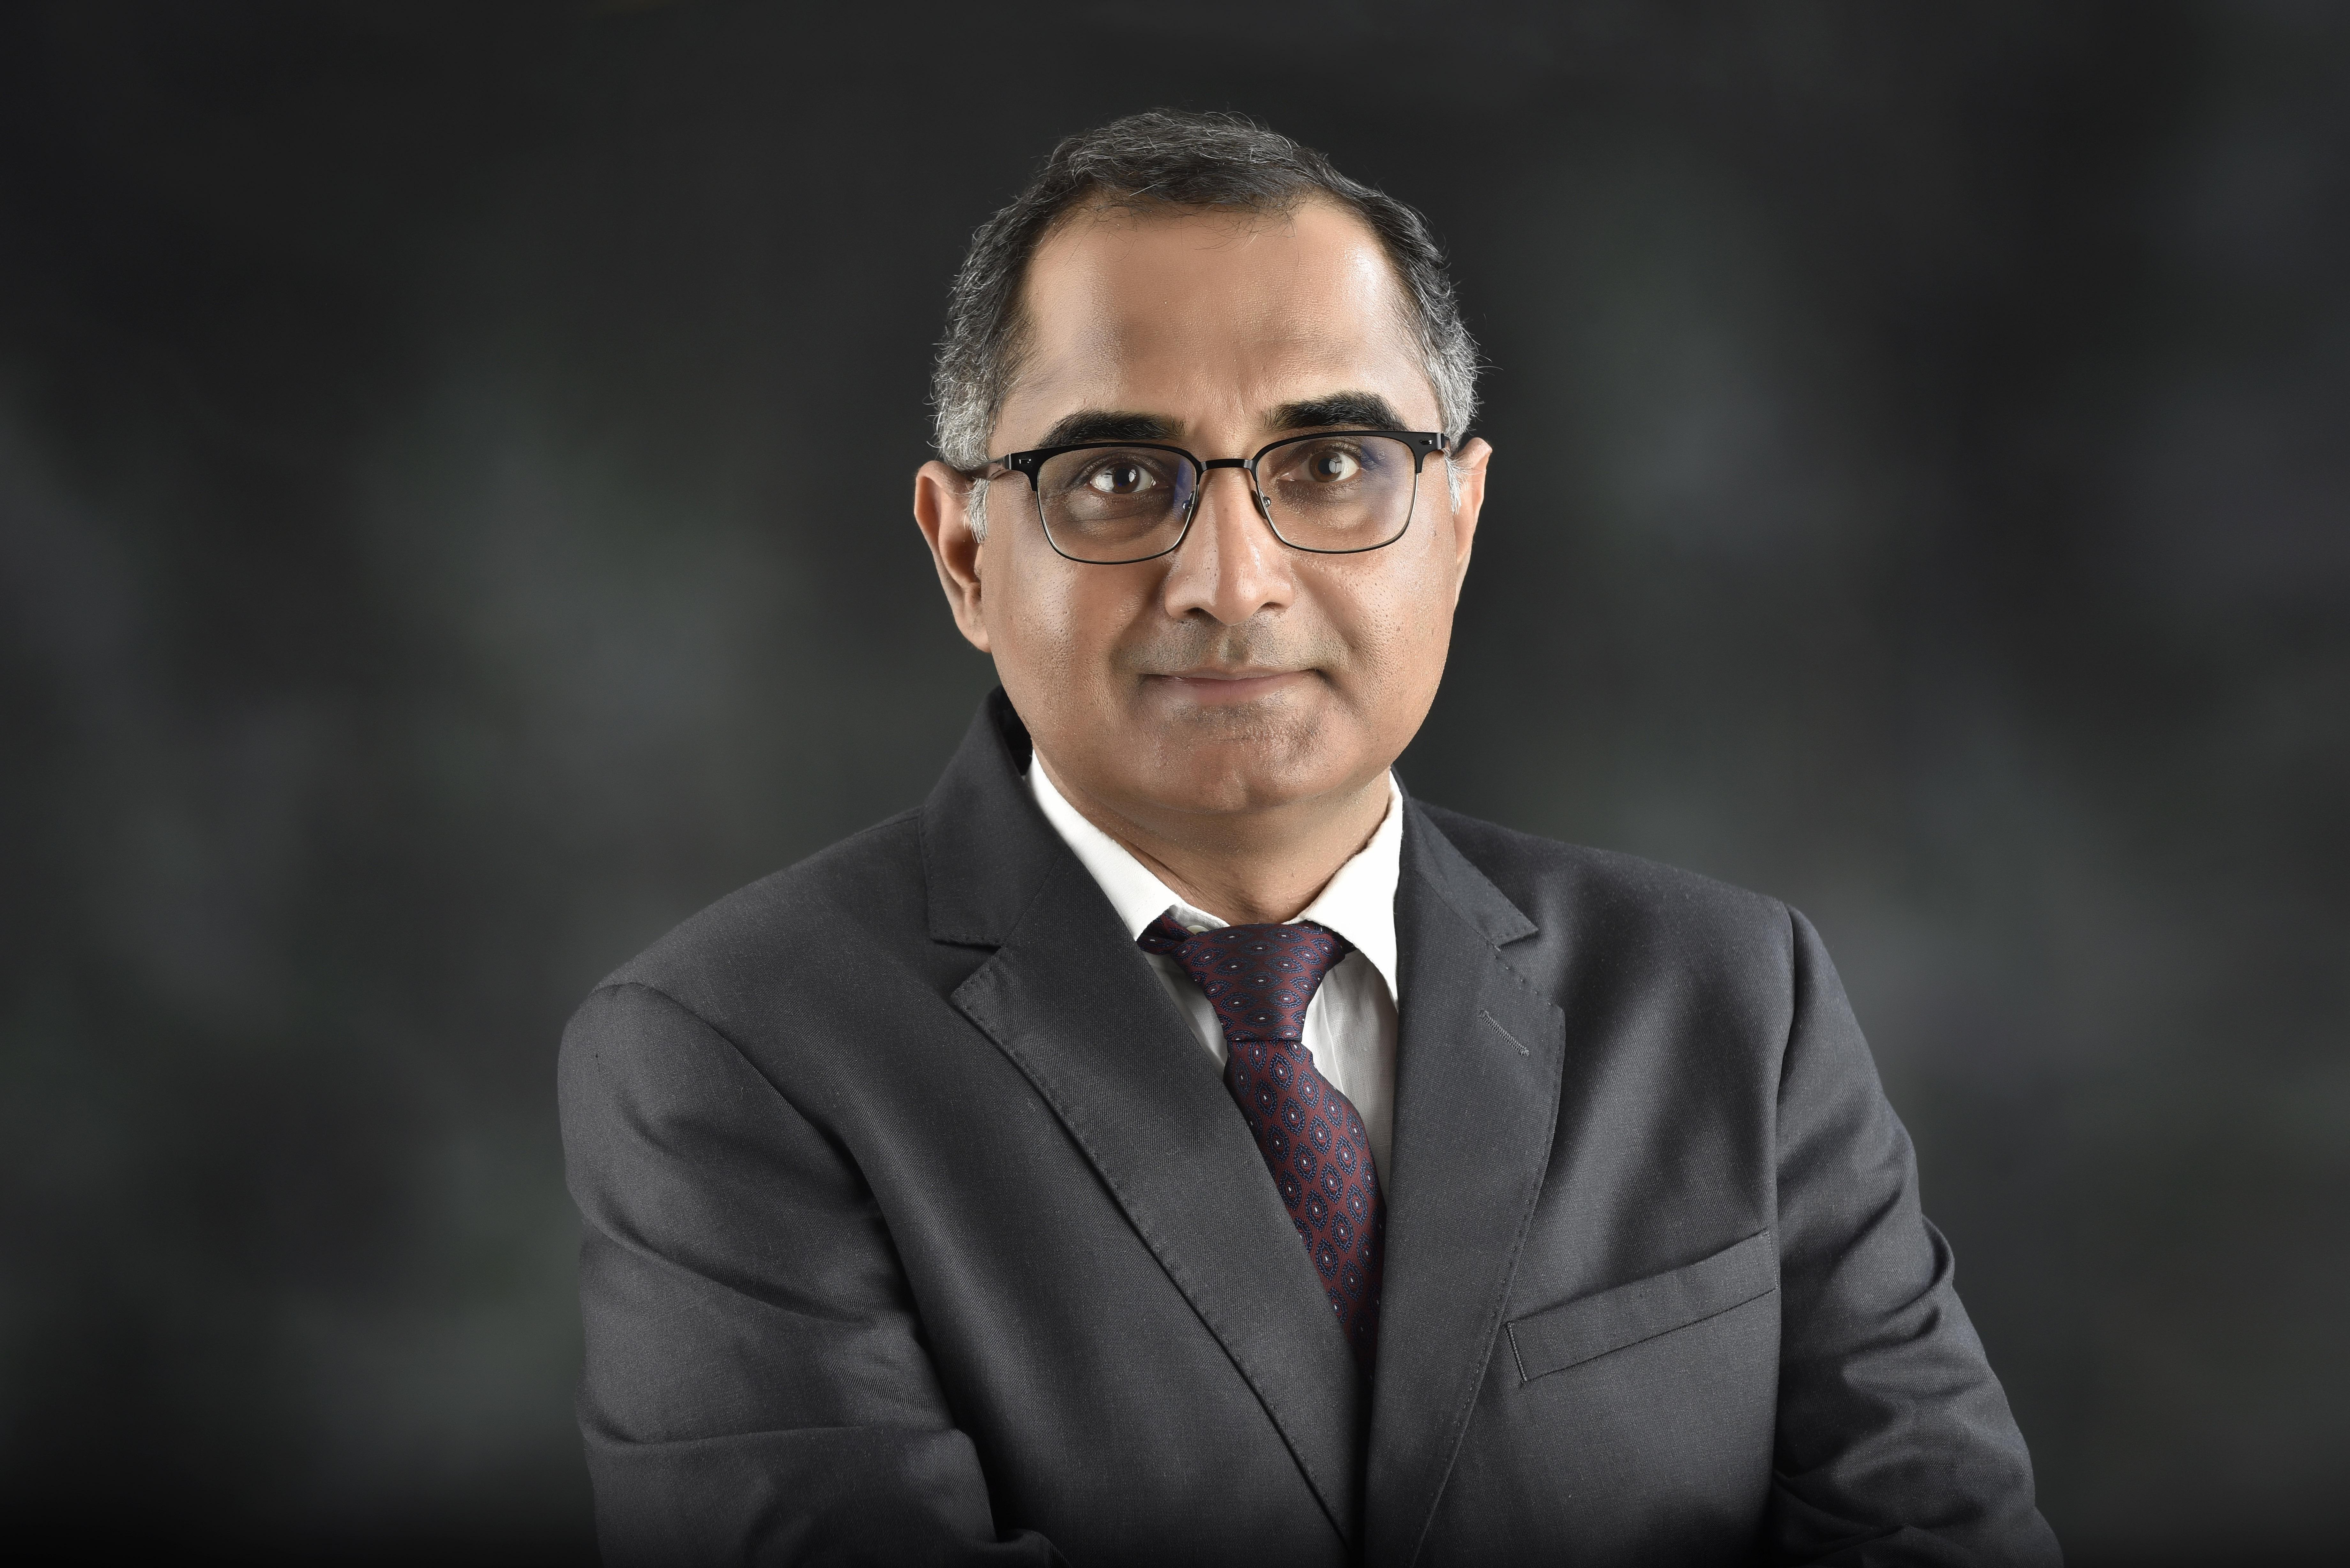 Mr. Rohit Patravali